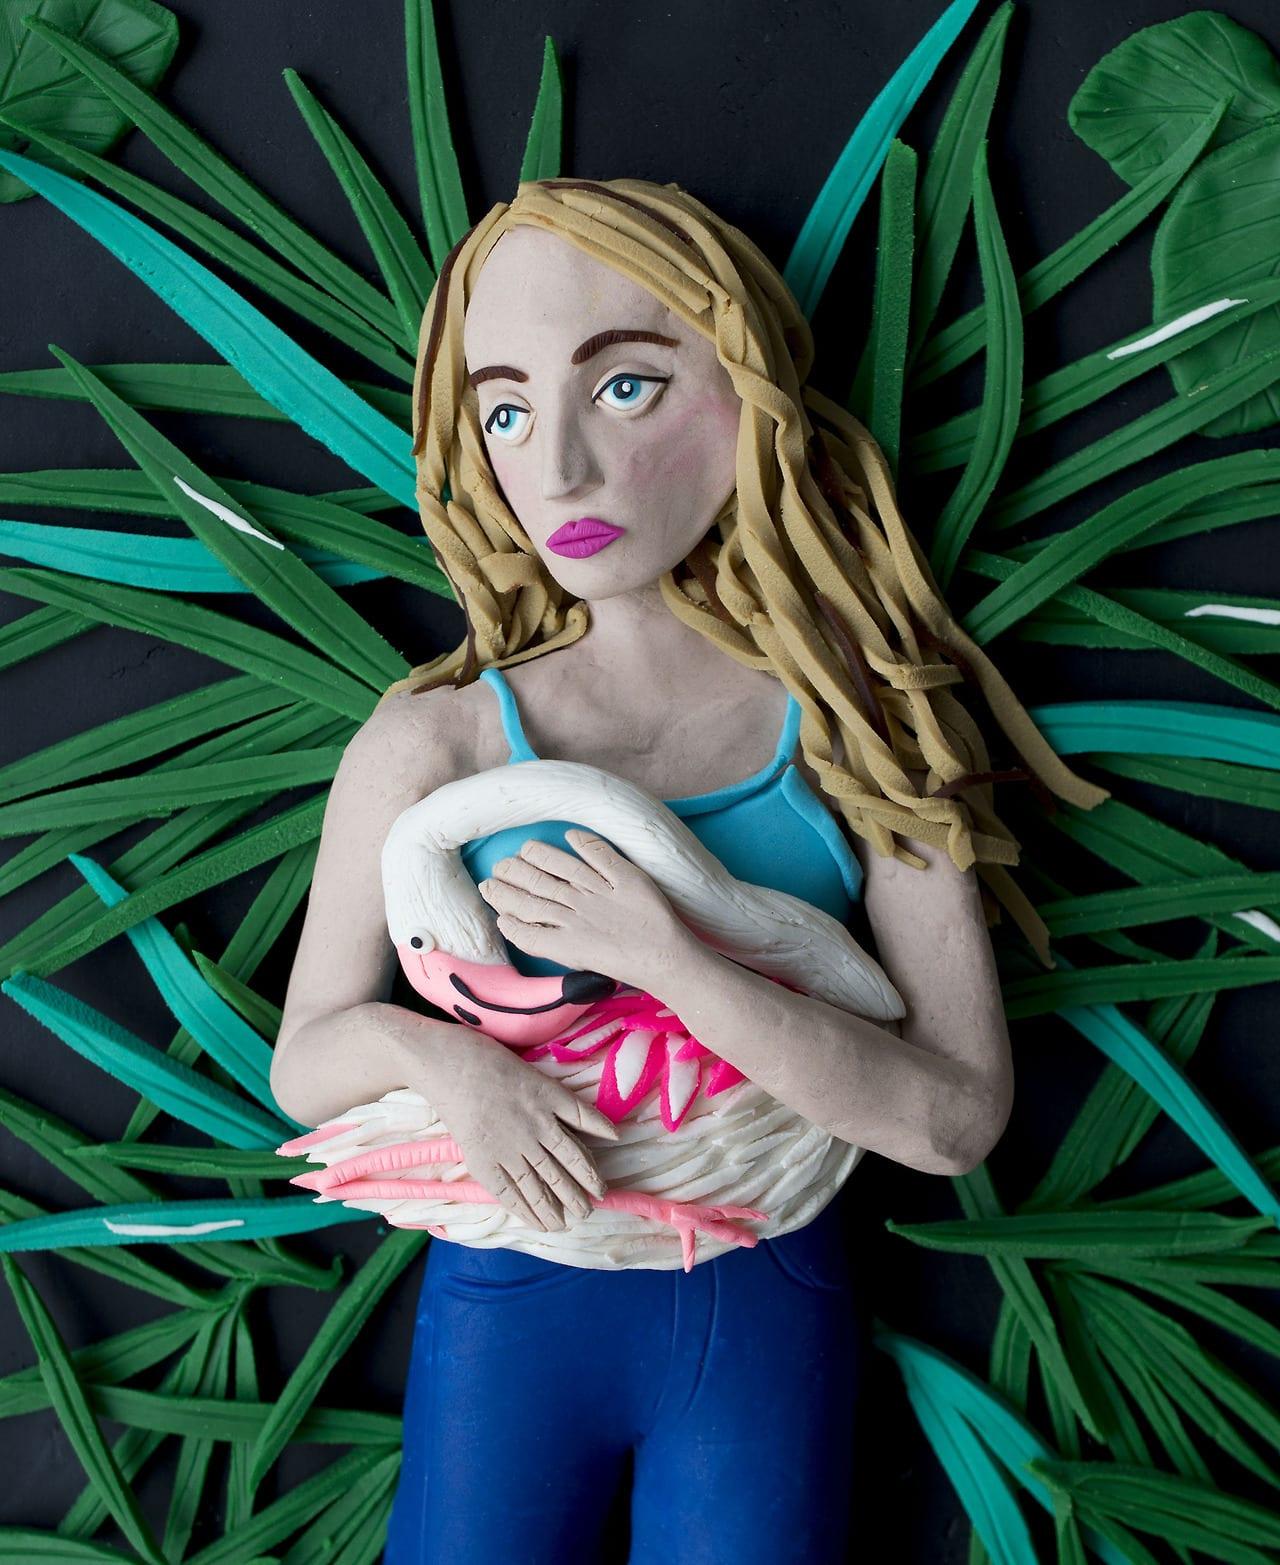 "<span class=""link fancybox-details-link""><a href=""/artists/49-eleanor-macnair/works/975-eleanor-macnair-original-photograph-frank-flamingo-from-the-series-amelia/"">View Detail Page</a></span><div class=""artist""><strong>Eleanor Macnair</strong></div> <div class=""title""><em>Original photograph: Frank Flamingo from the series 'Amelia and the Animals' by Robin Schwartz</em></div> <div class=""medium"">Archival Pigment Print</div> <div class=""edition_details"">Edition of 5</div>"